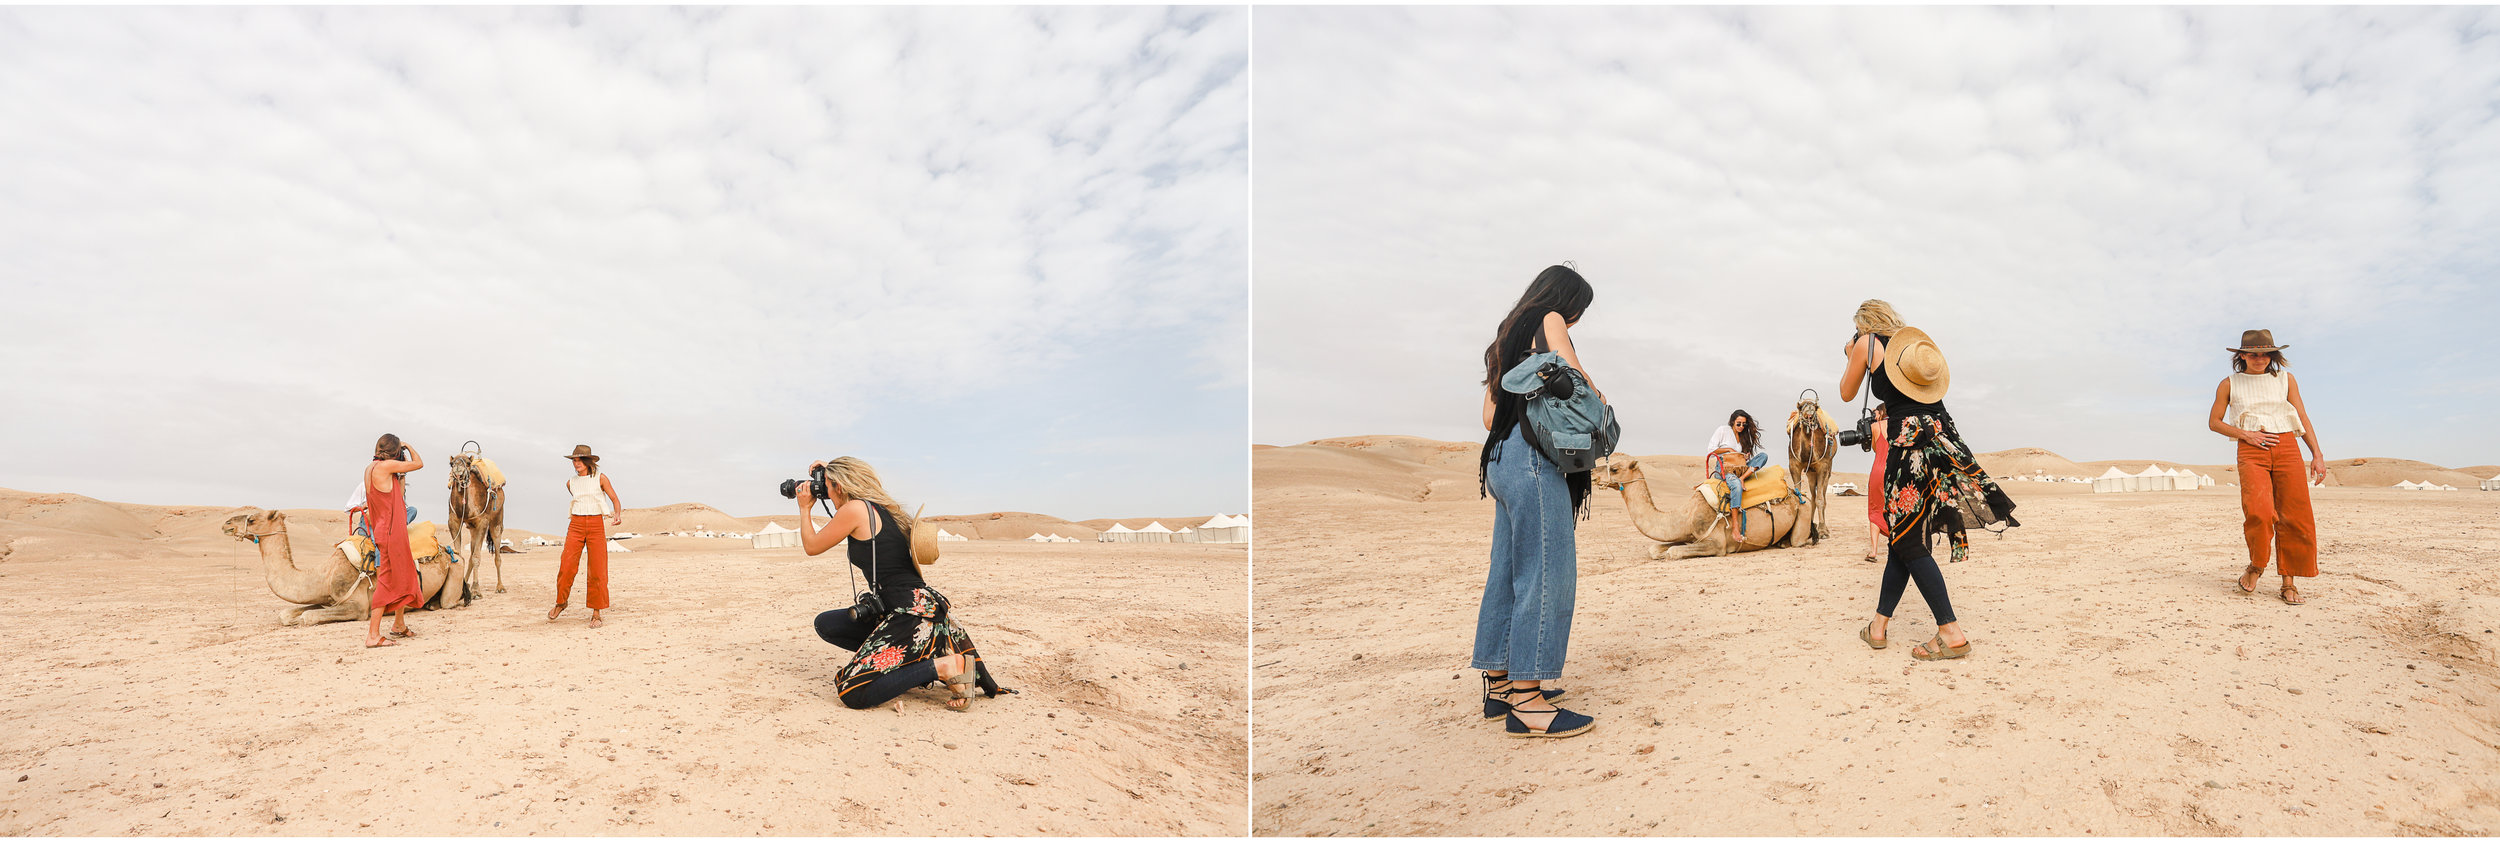 Morocco Photography Adventure 26.jpg